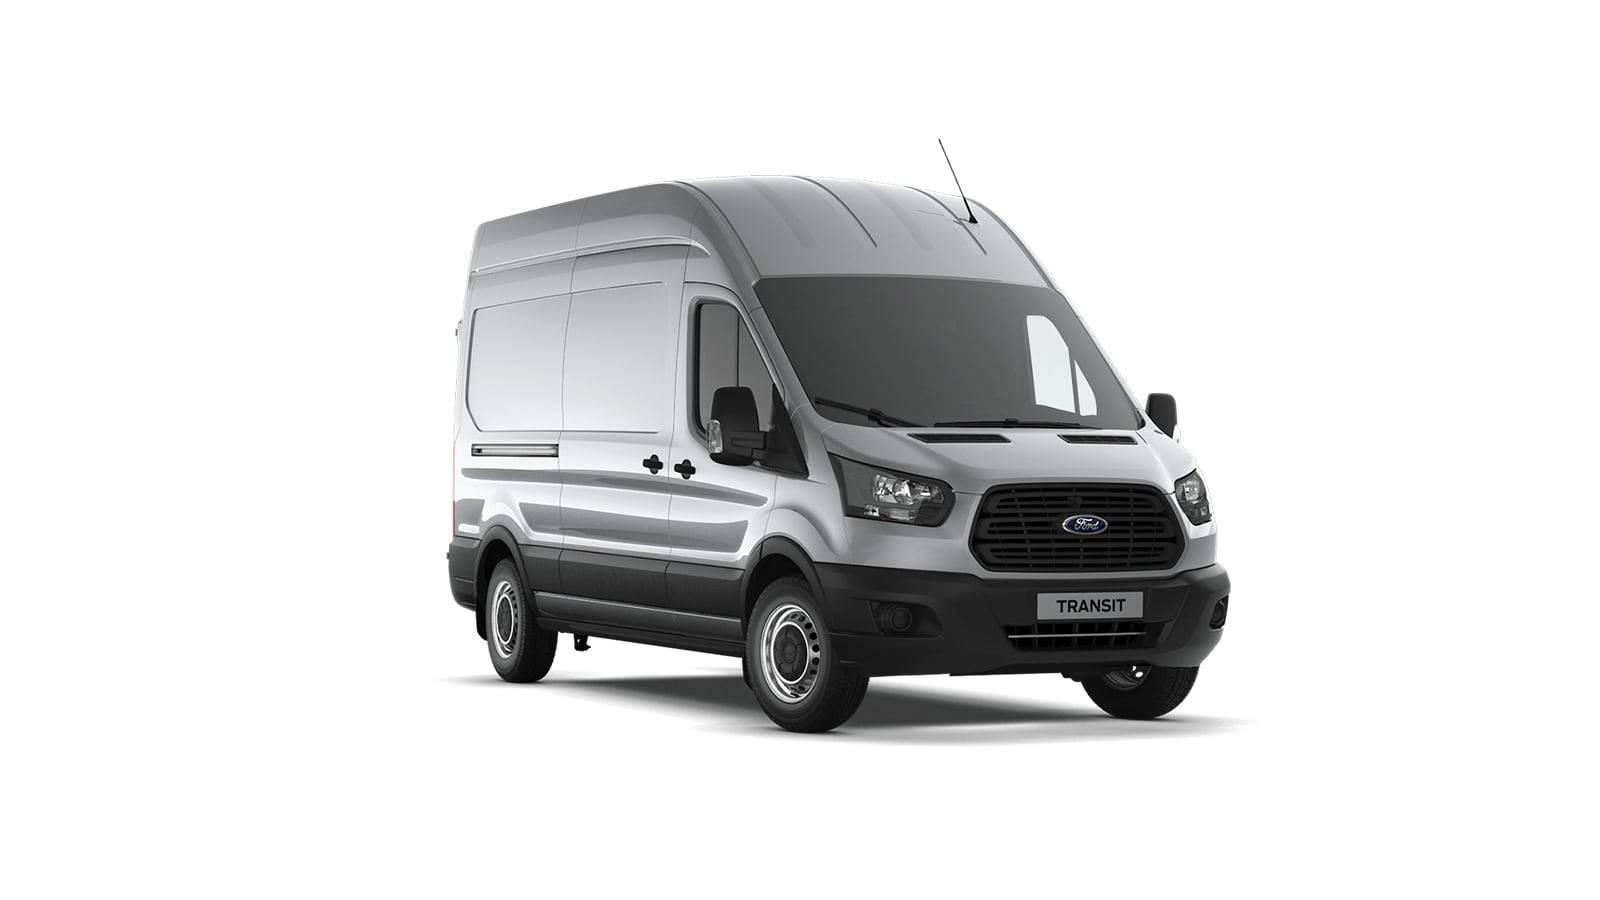 FORD TRANSIT 2.2 TDCI MT (125 л.с.) Грузовой фургон L3H3 Переднеприводный фургон (350 L3H3)